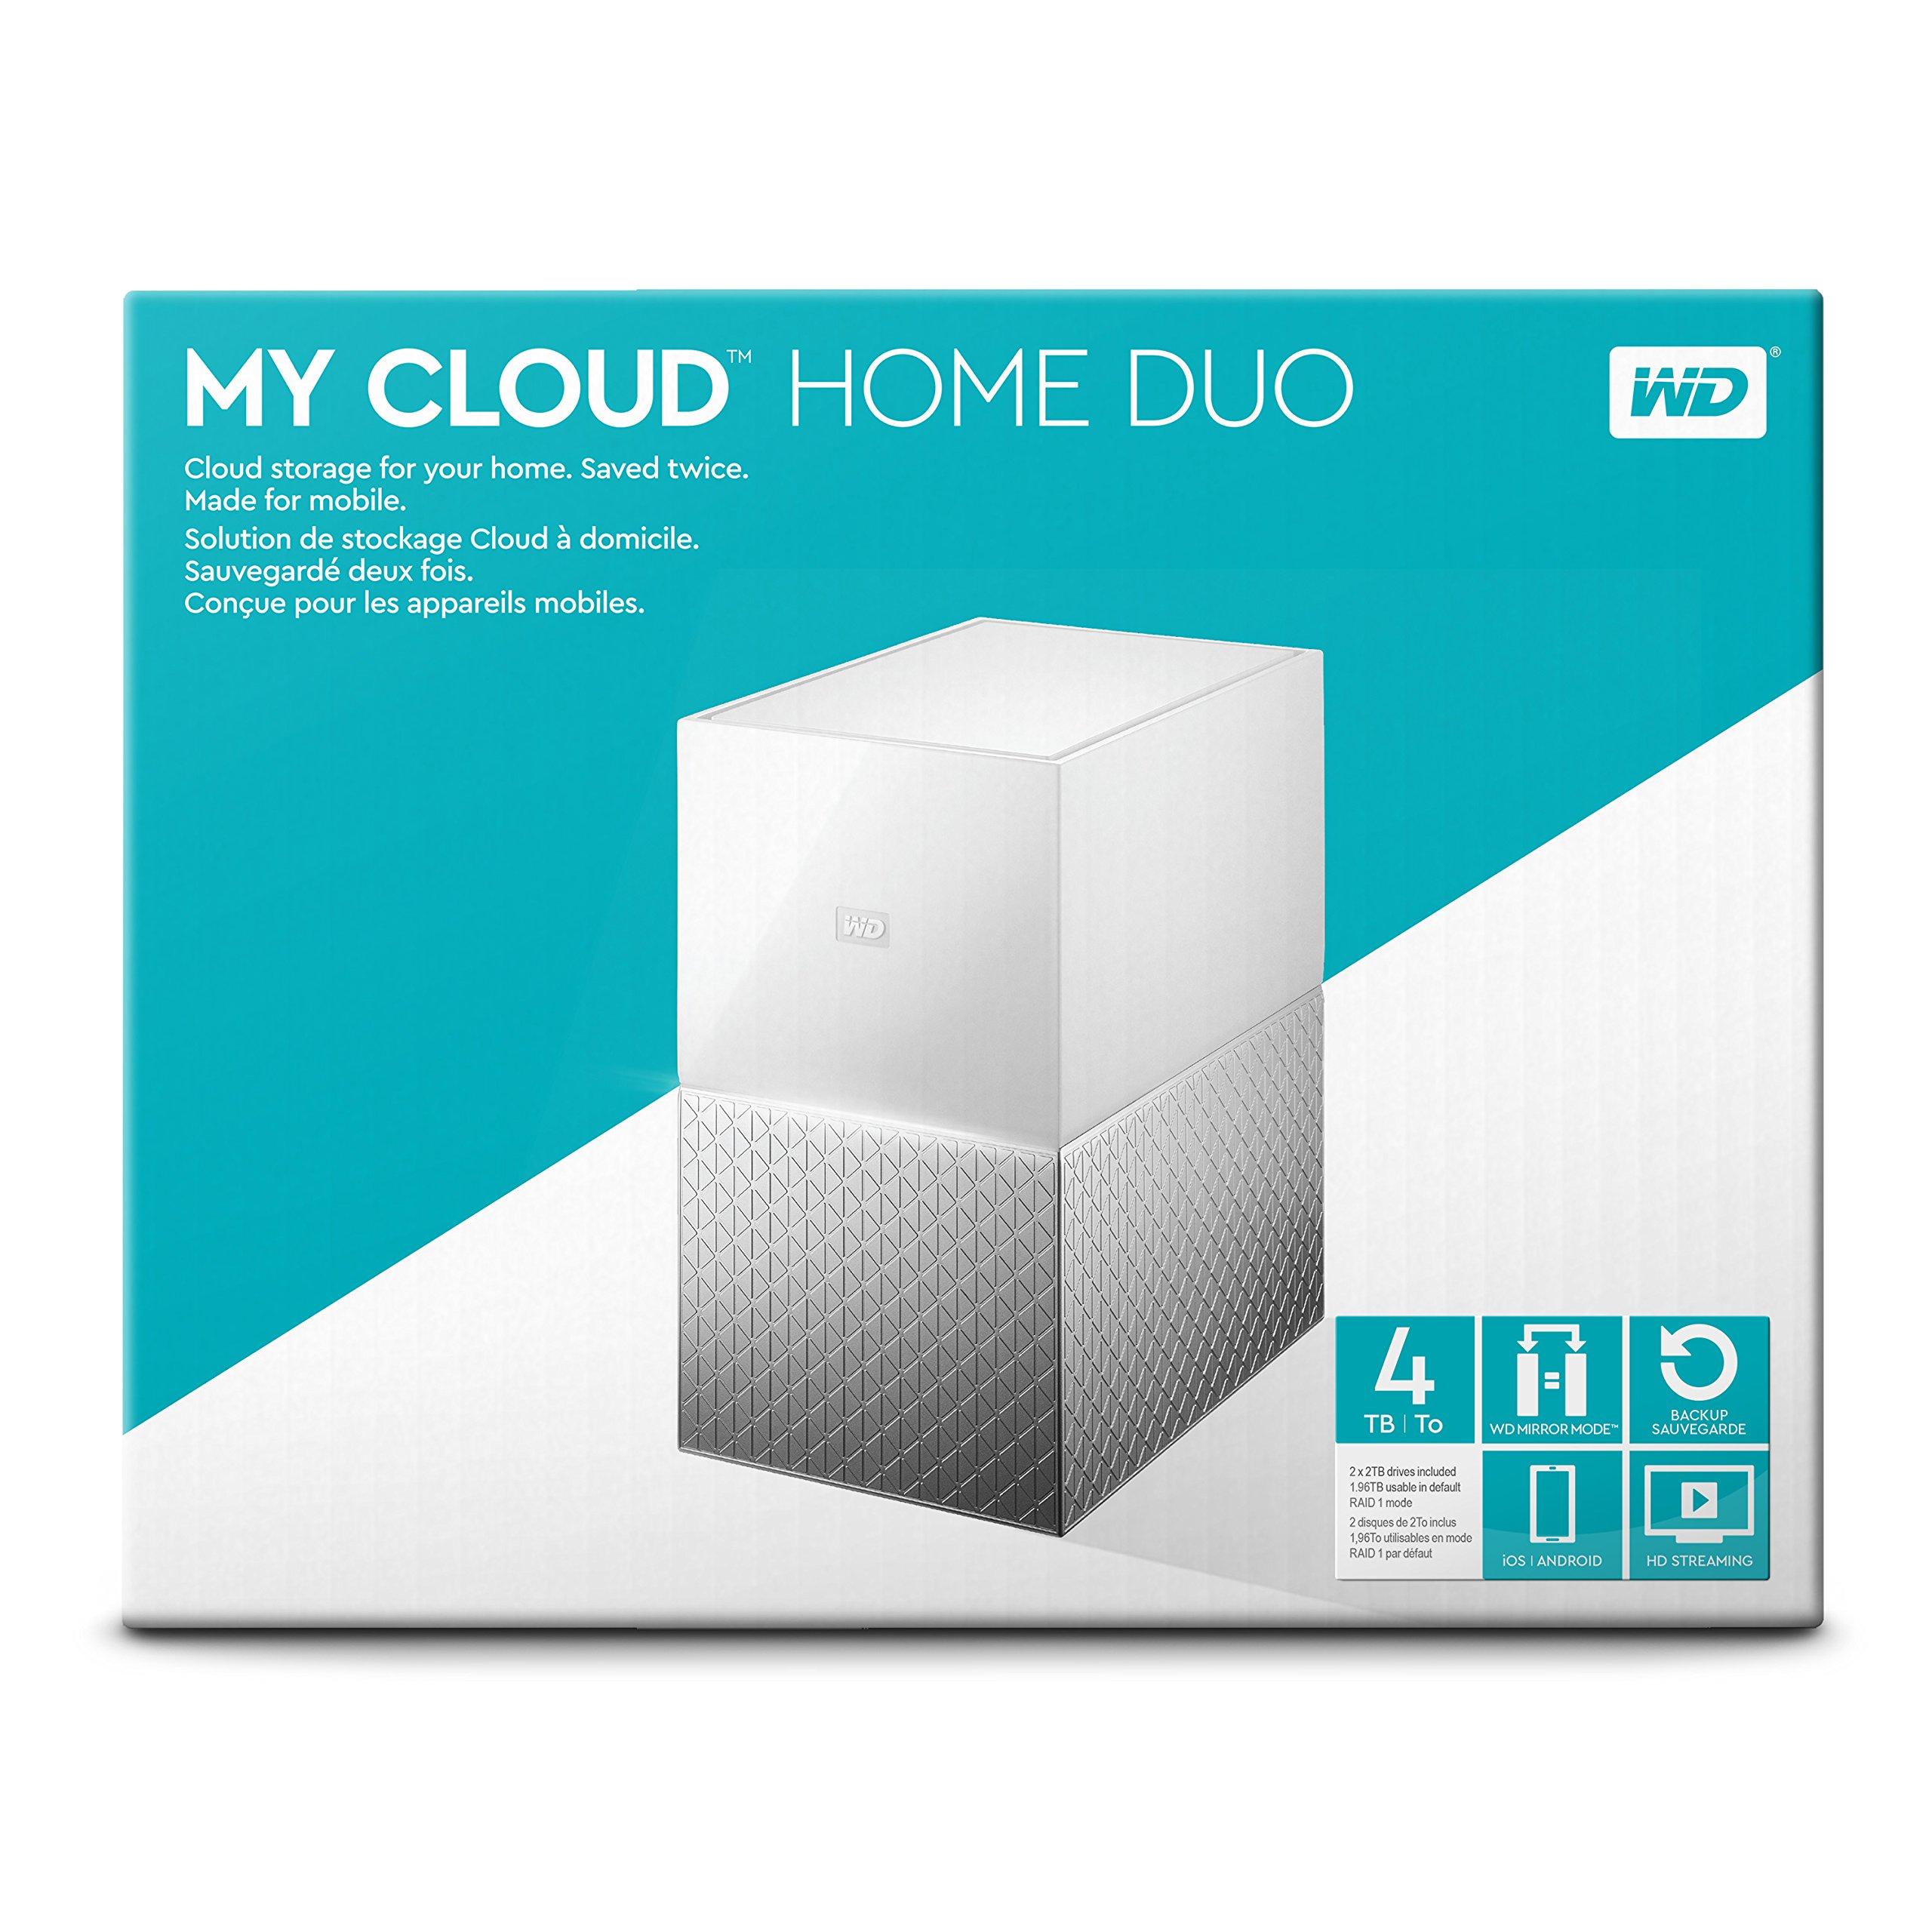 WD 8TB My Cloud Home Duo Personal Cloud Storage - Dual Drive - WDBMUT0080JWT-NESN by Western Digital